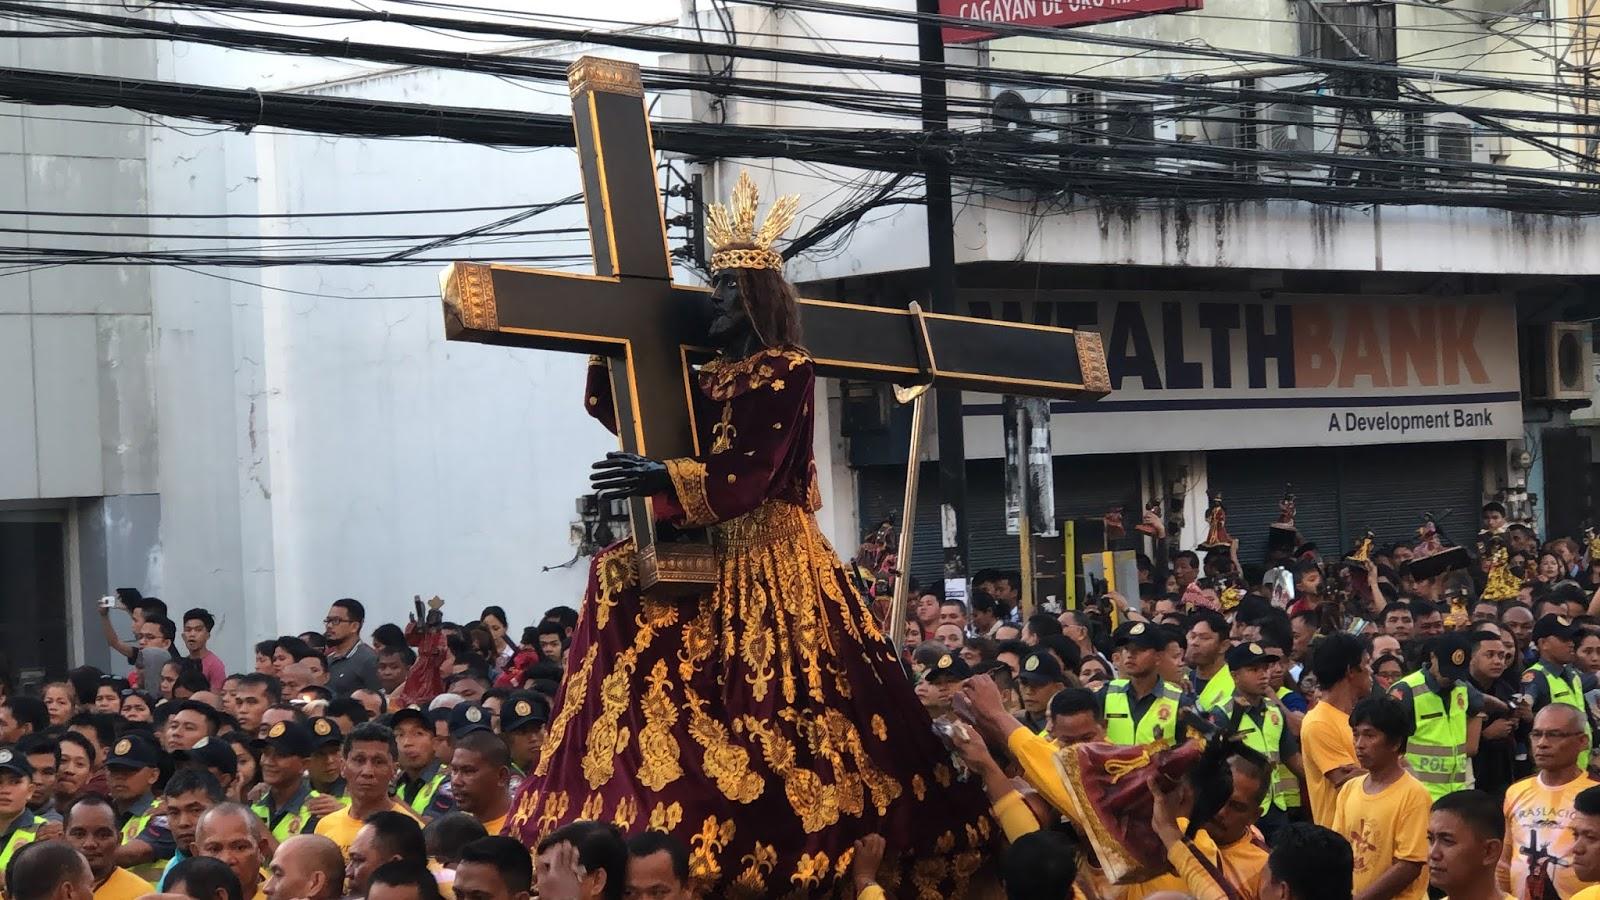 10th Year Celebration of the Traslacion of the Black Nazarene in CDO